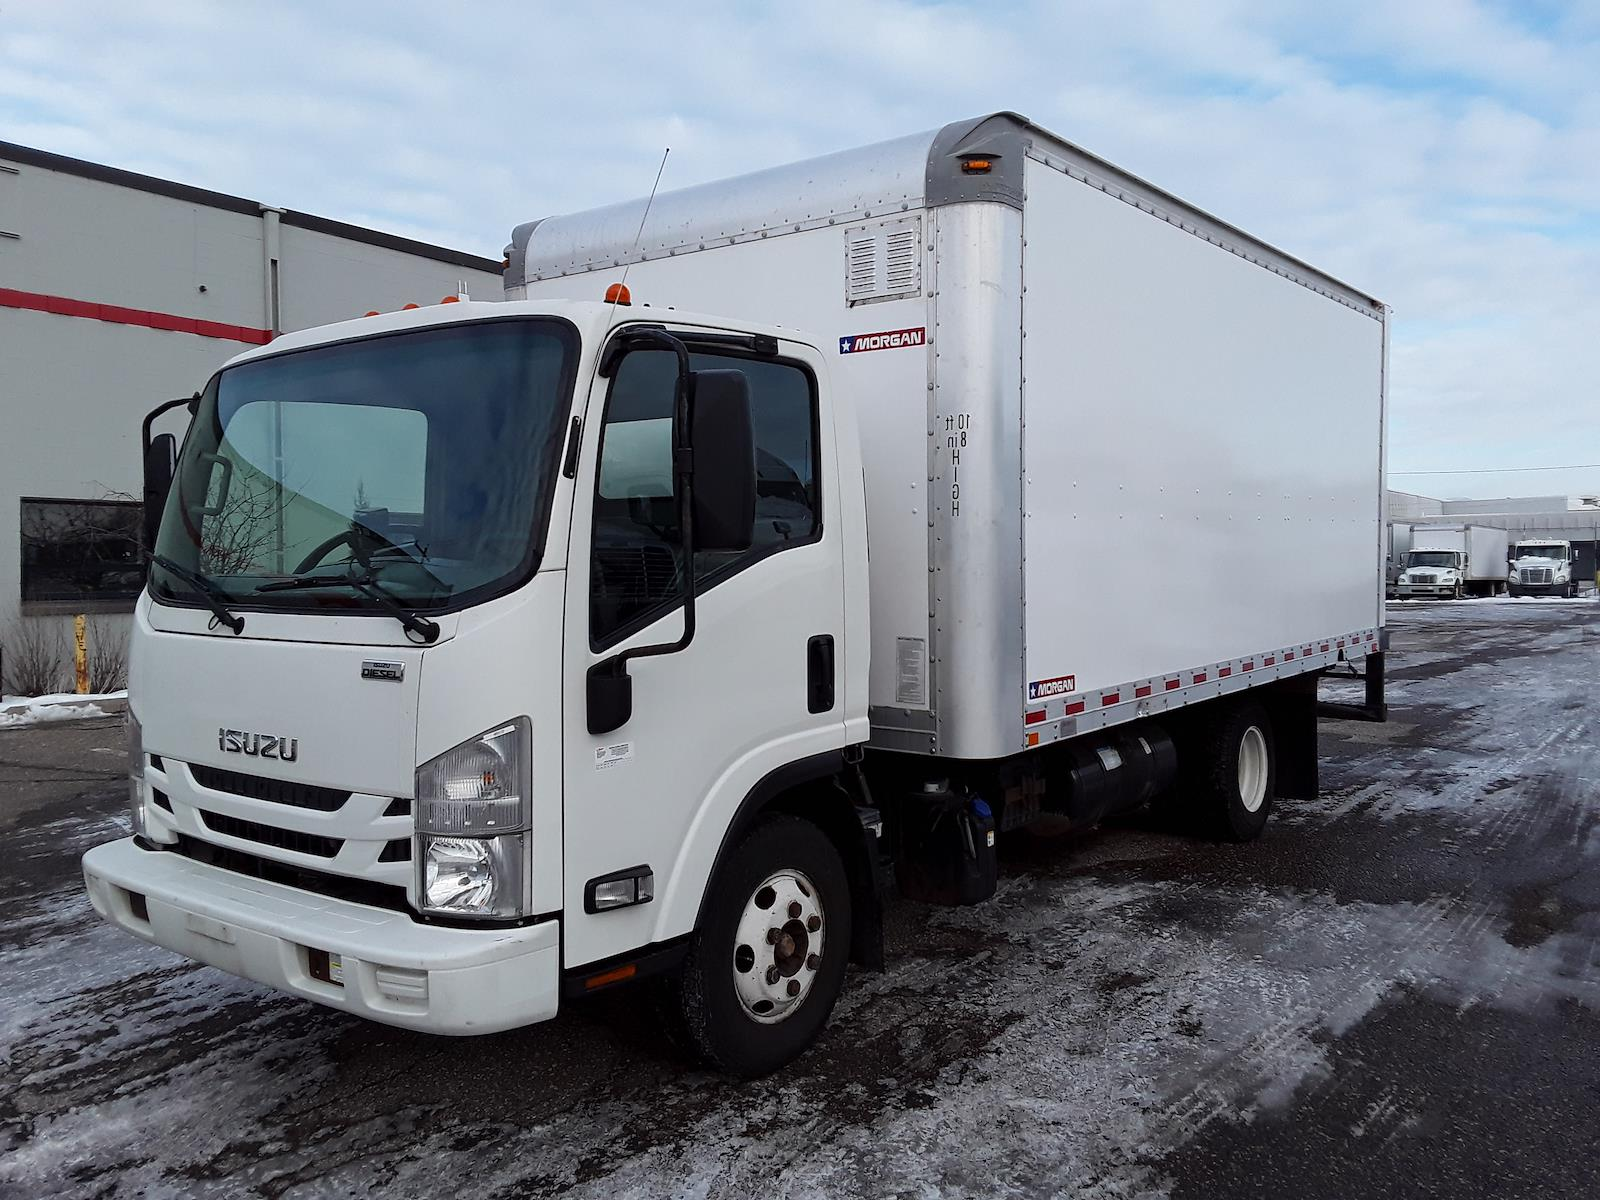 2016 Isuzu NPR Regular Cab 4x2, Dry Freight #683137 - photo 1